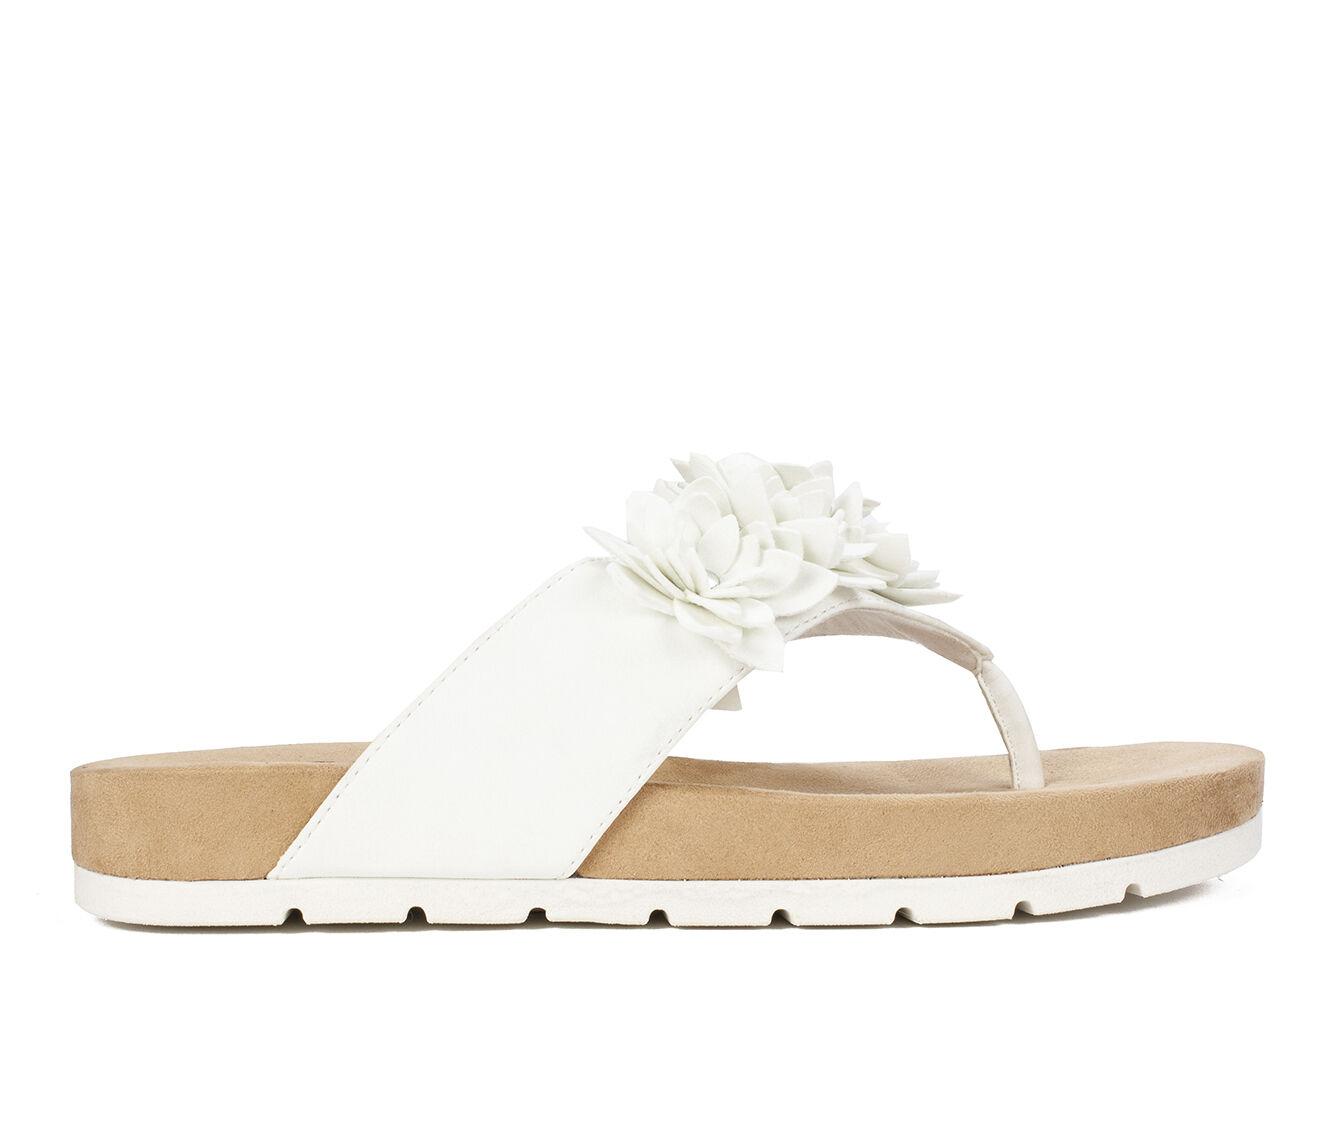 Outdoor Sports Women's Cliffs Terris Sandals White